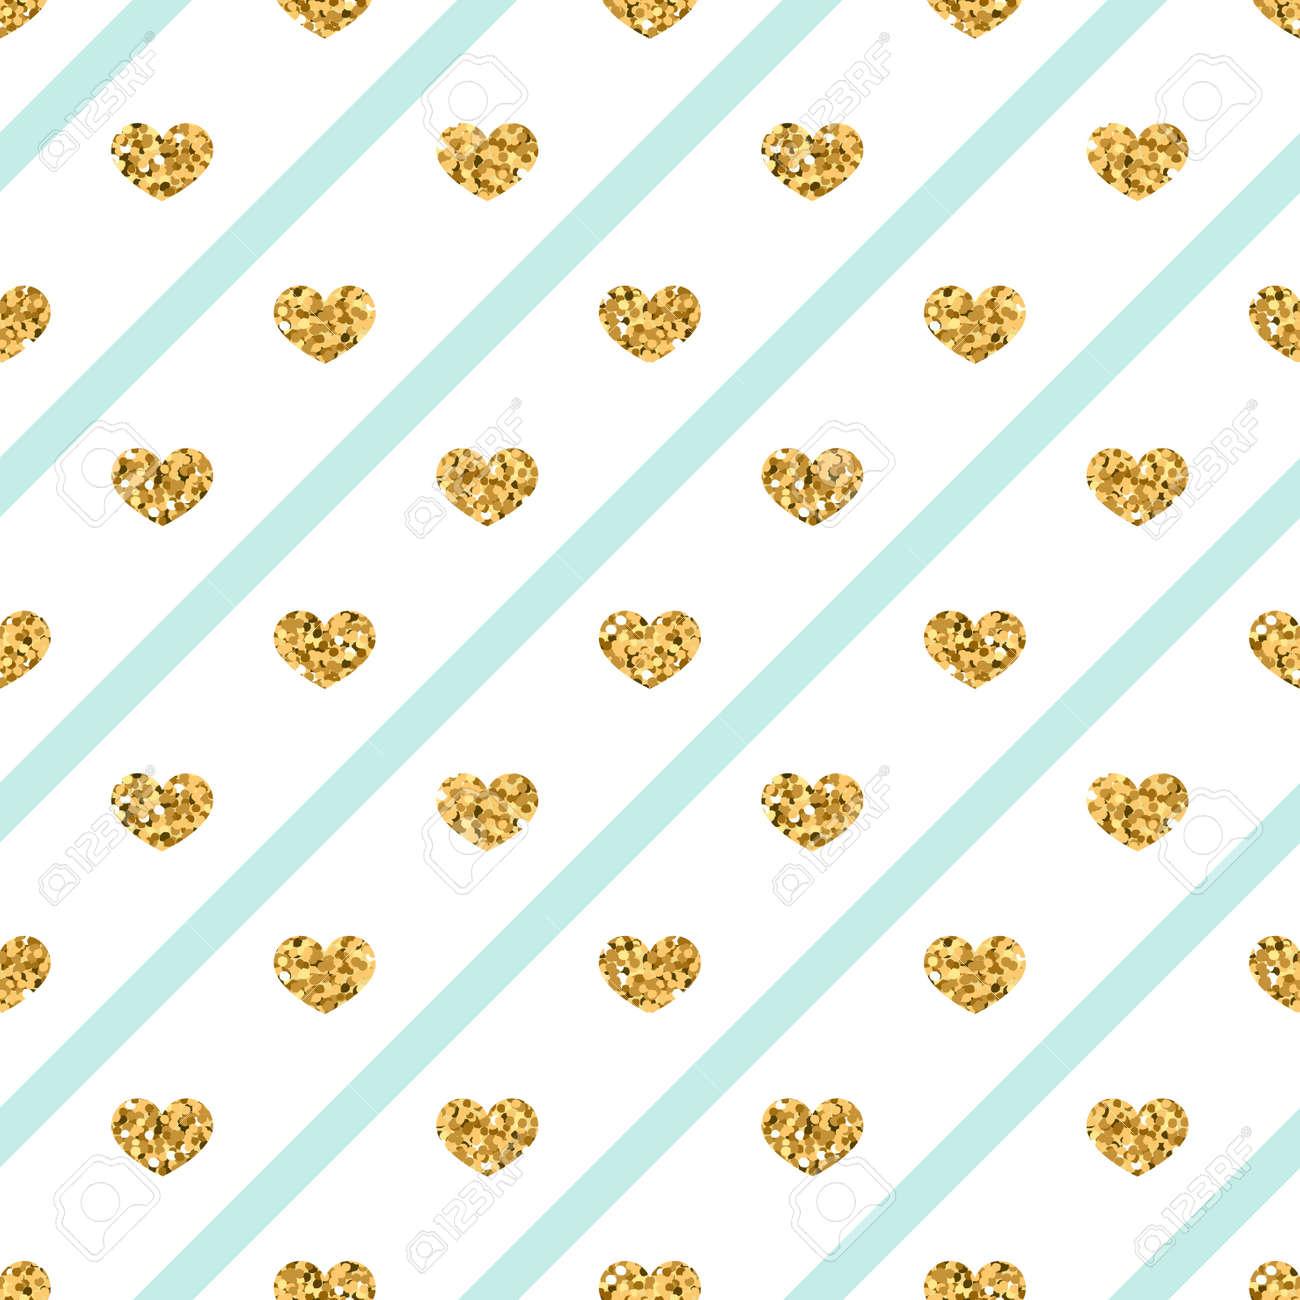 Golden Glitter Love Confetti Hearts On White Blue Line Background